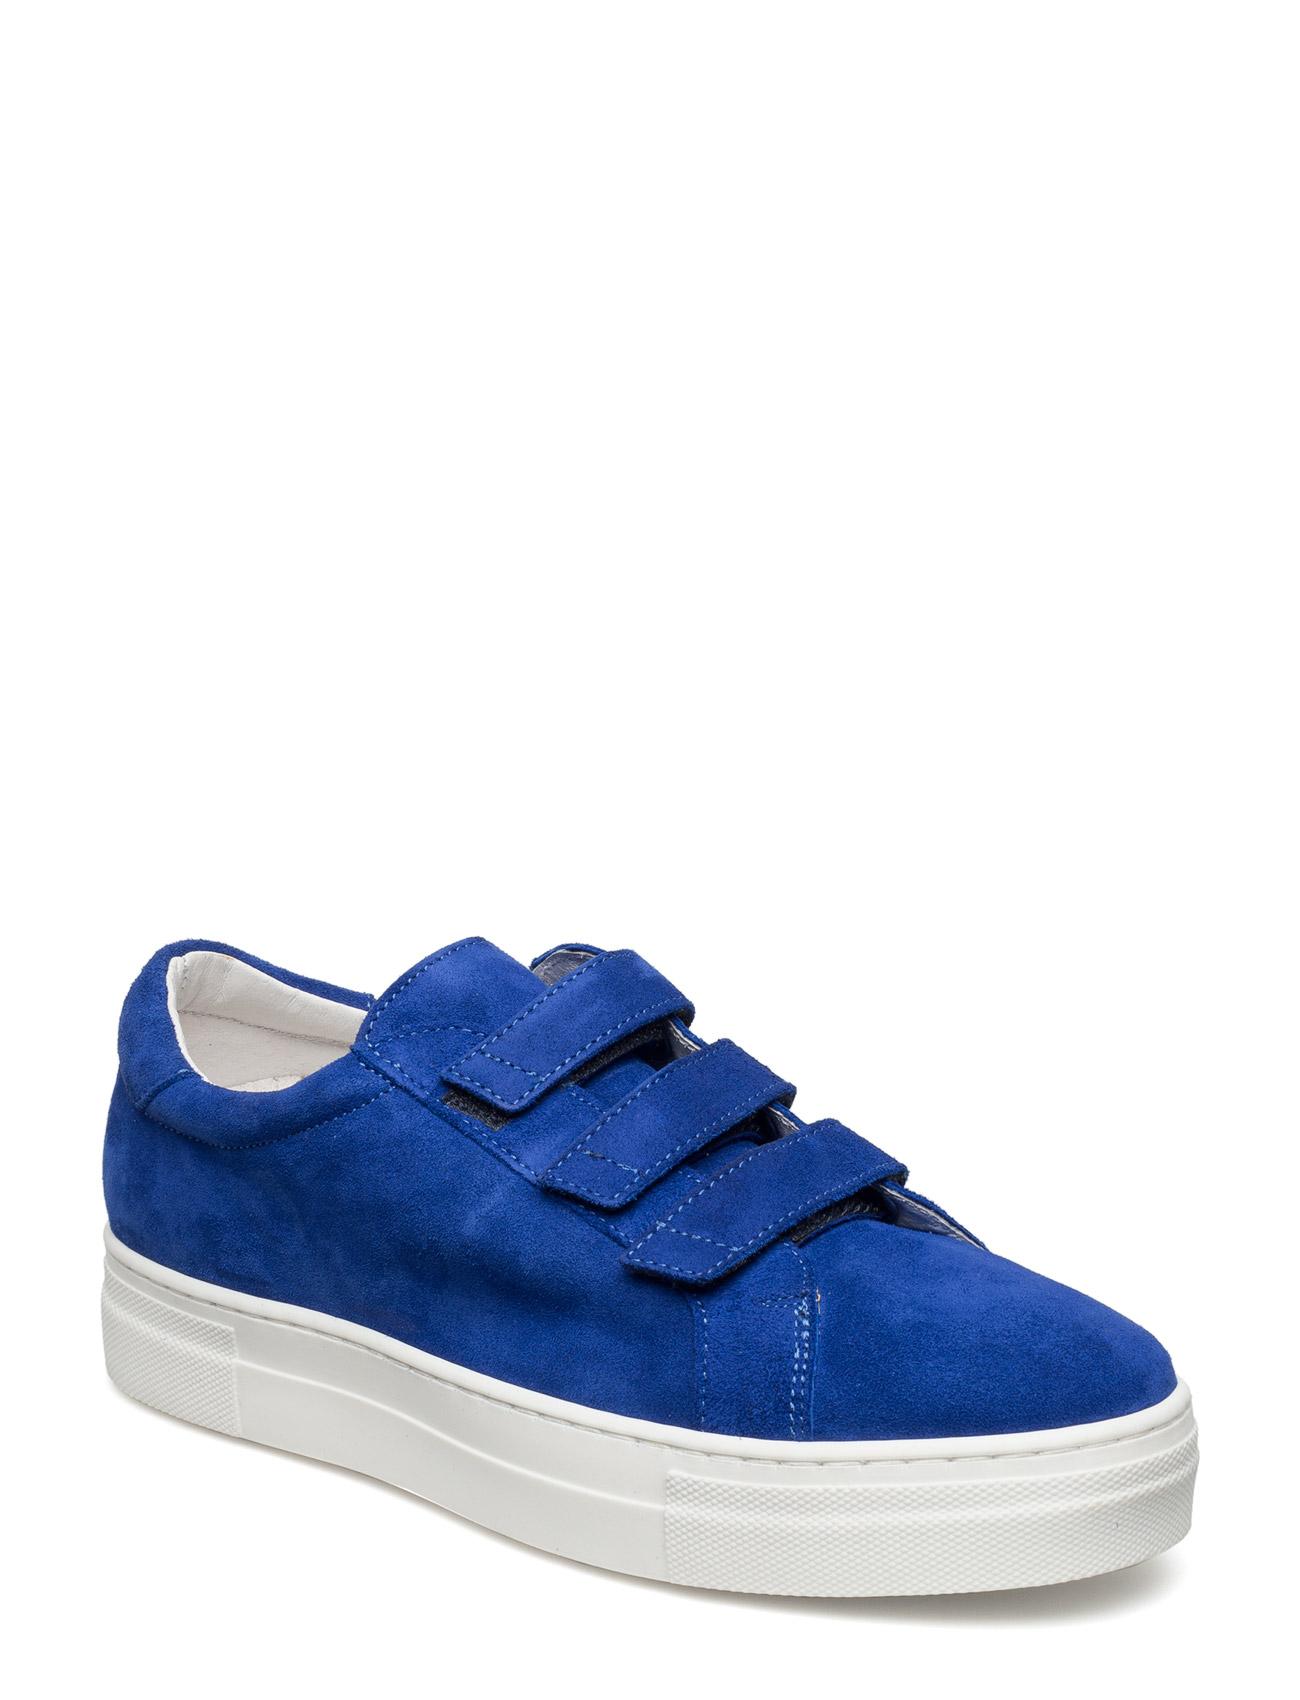 Megacoola Velcro Sneaker Italian Suede J. Lindeberg